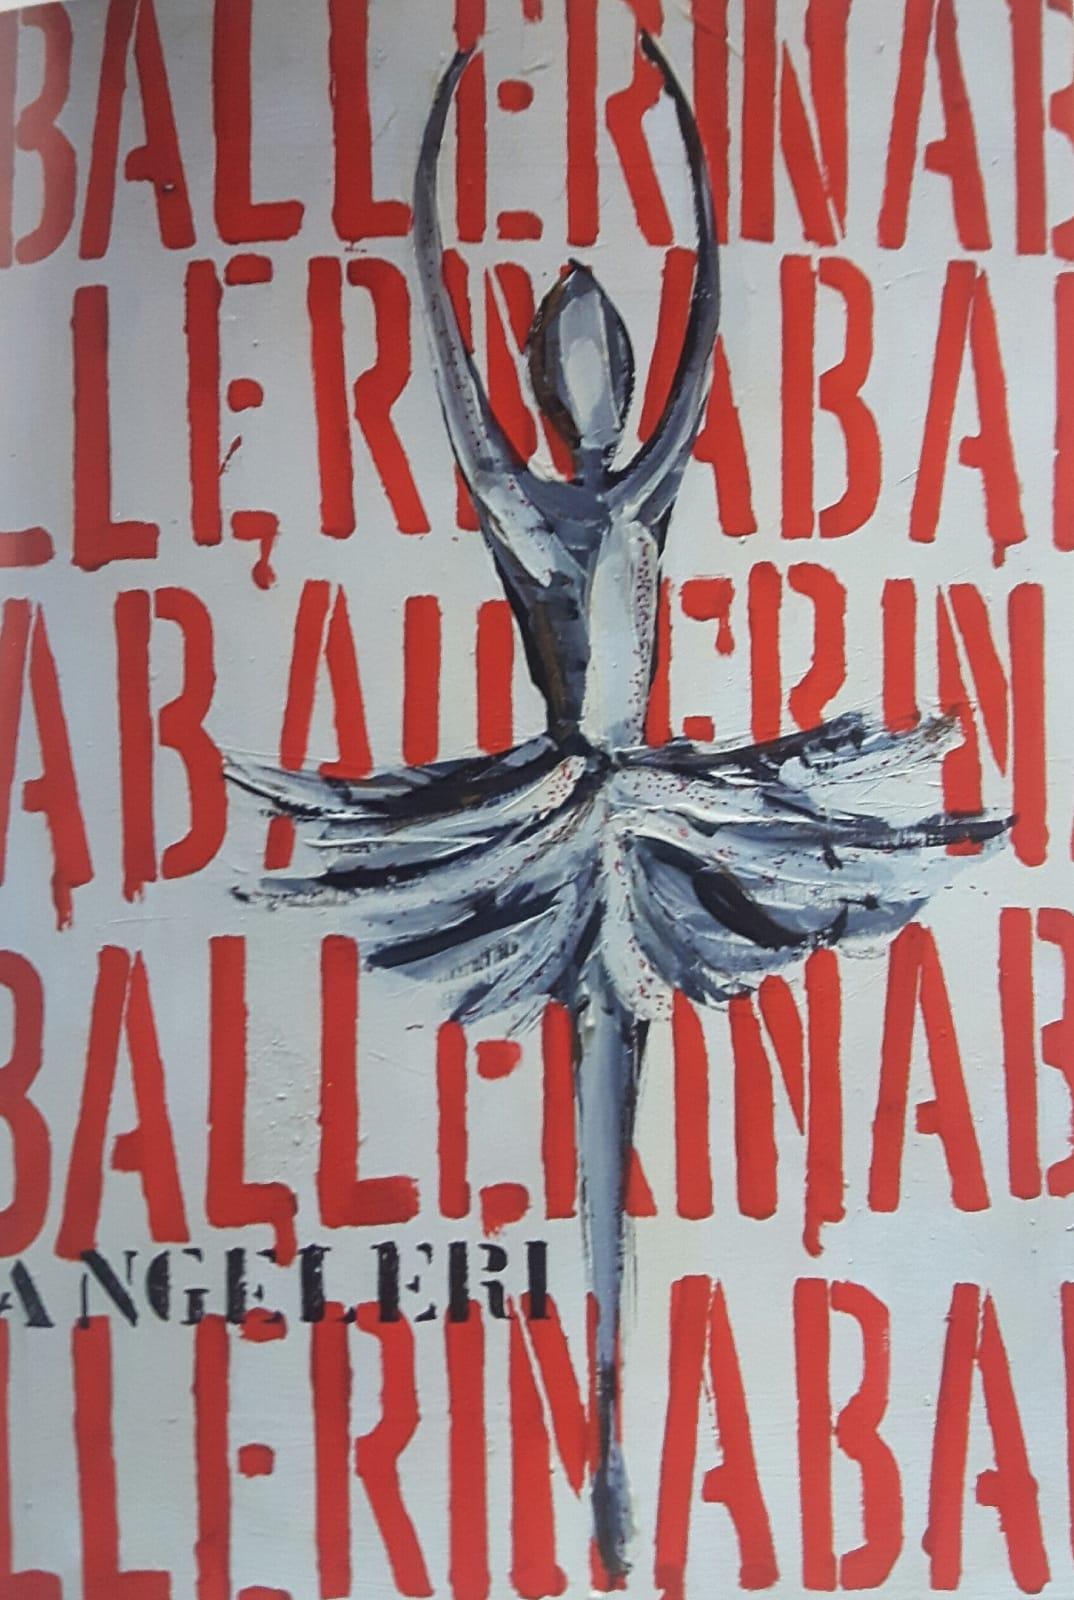 L'Artista_Angeleri_a_Monaco_Ballerina_Opera_di_Luciano Angeleri